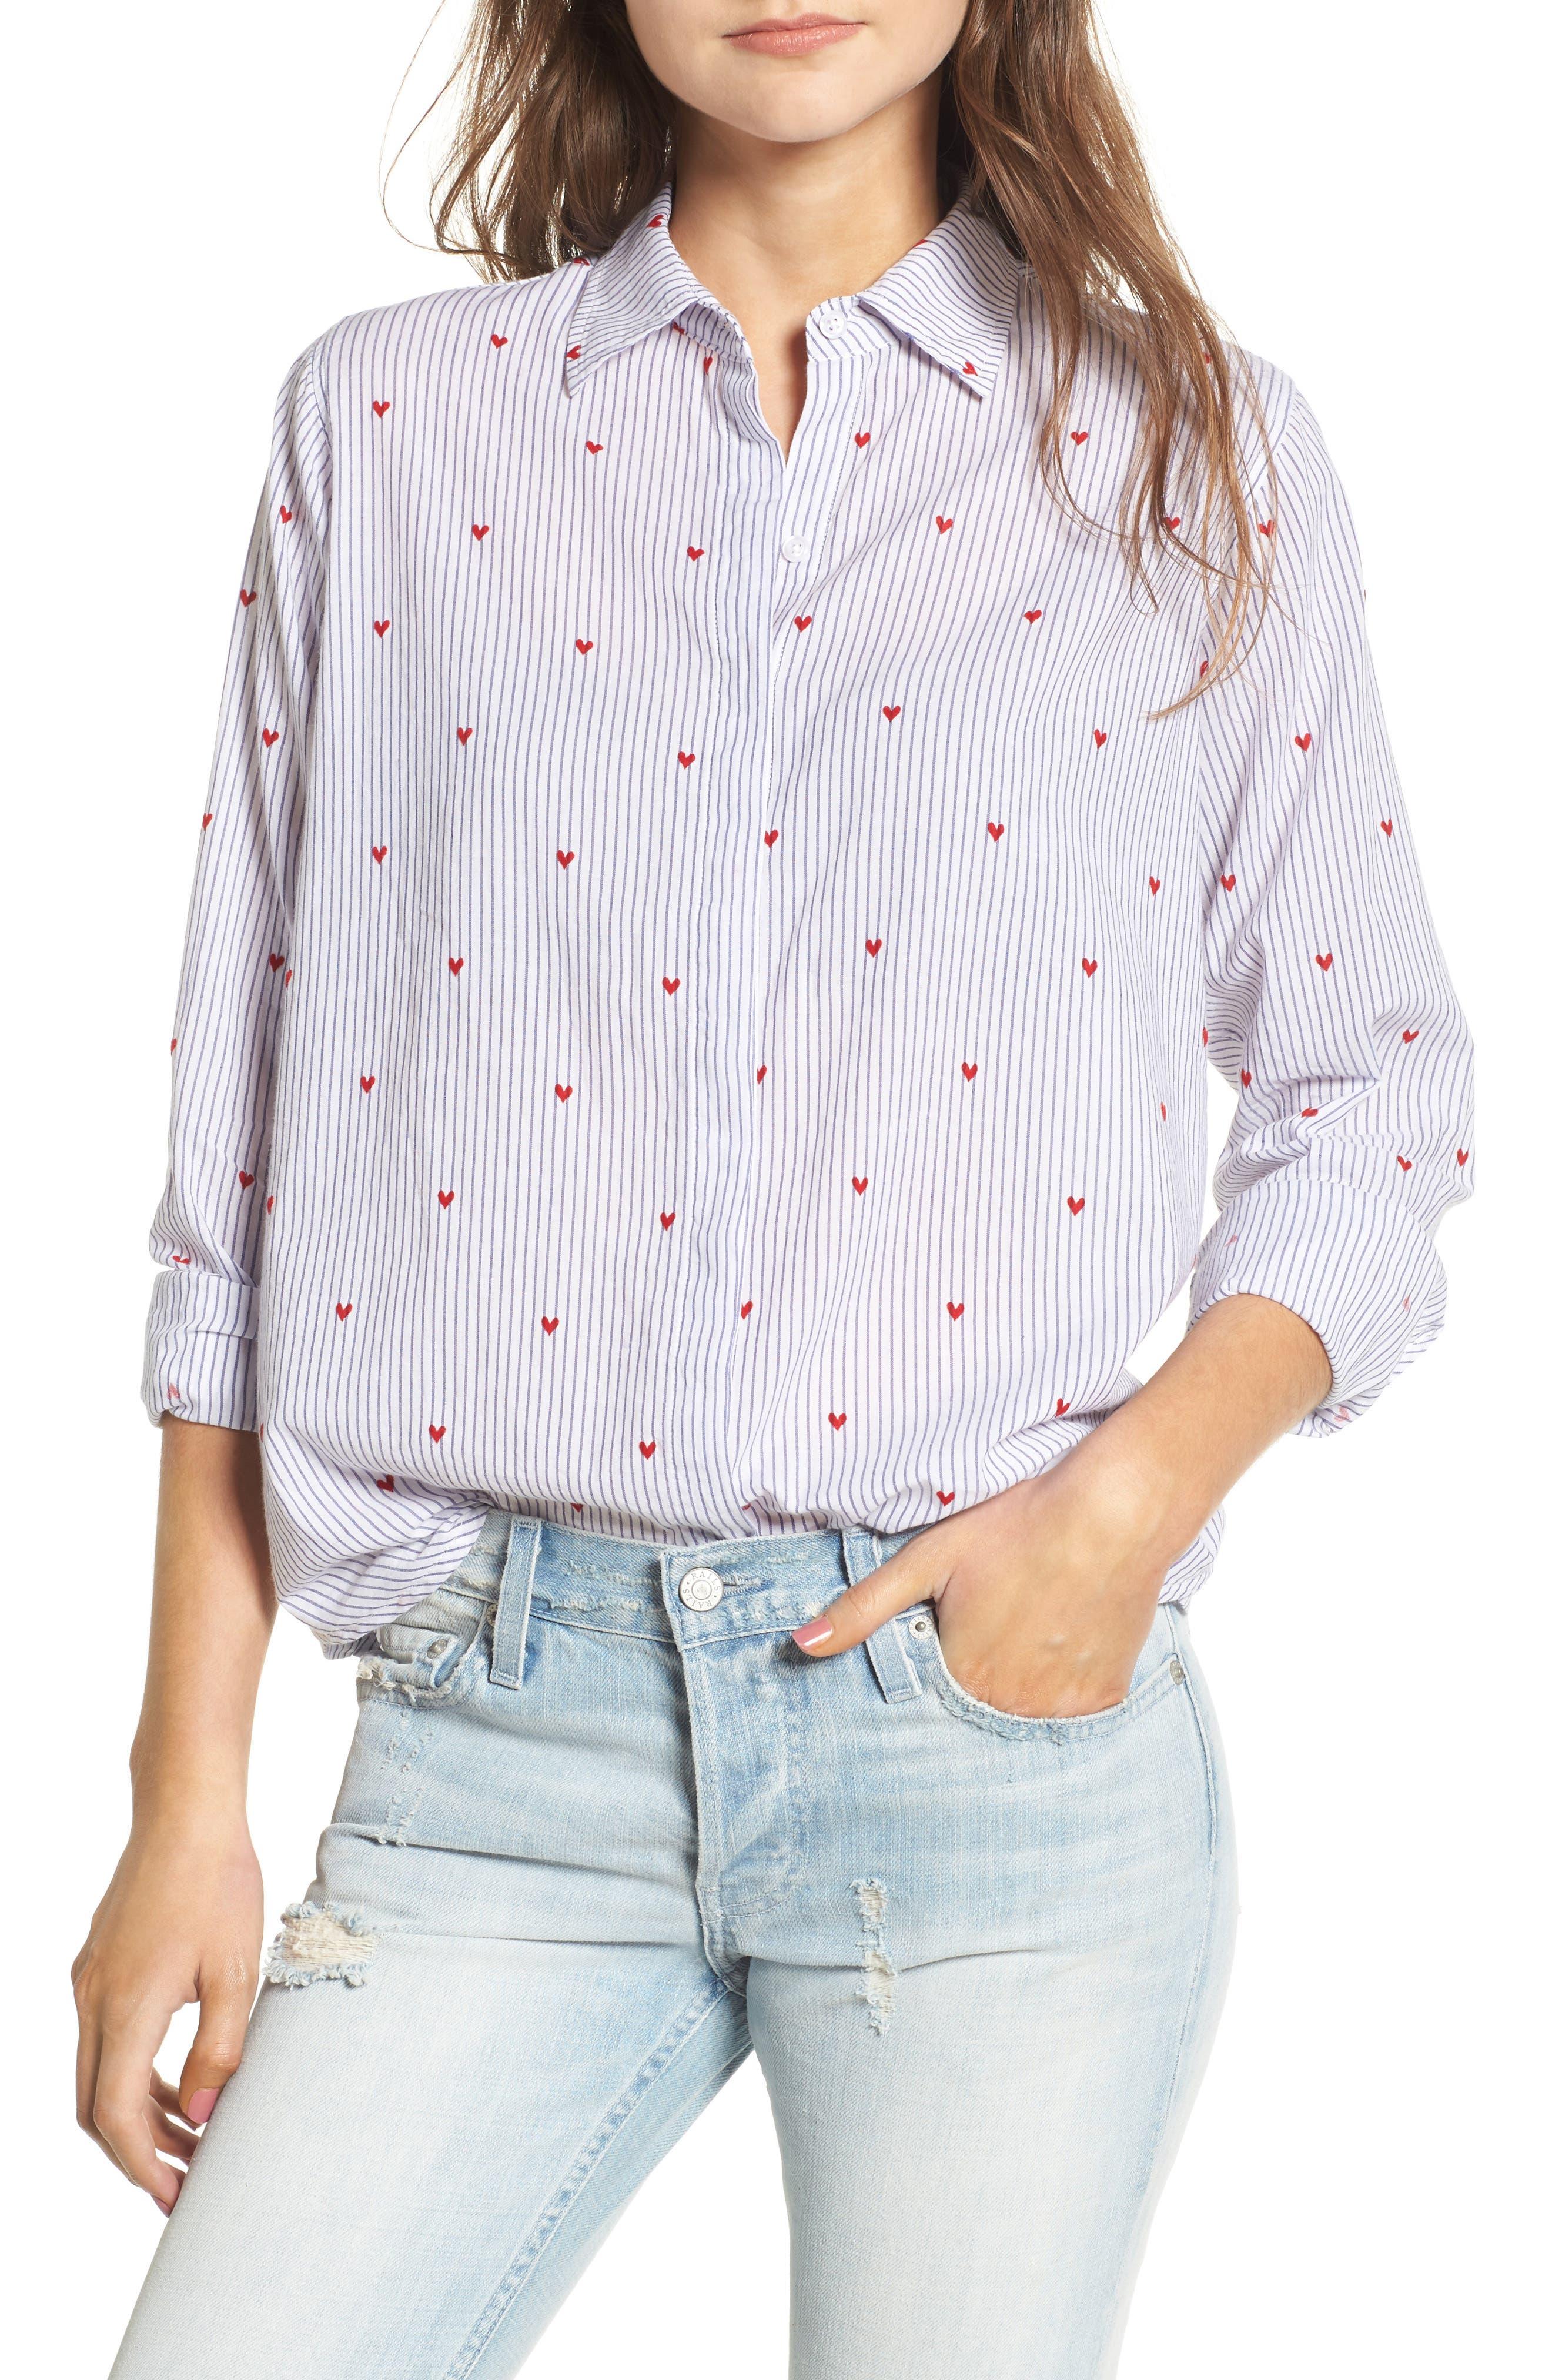 Taylor Heart Stripe Shirt,                             Main thumbnail 1, color,                             400